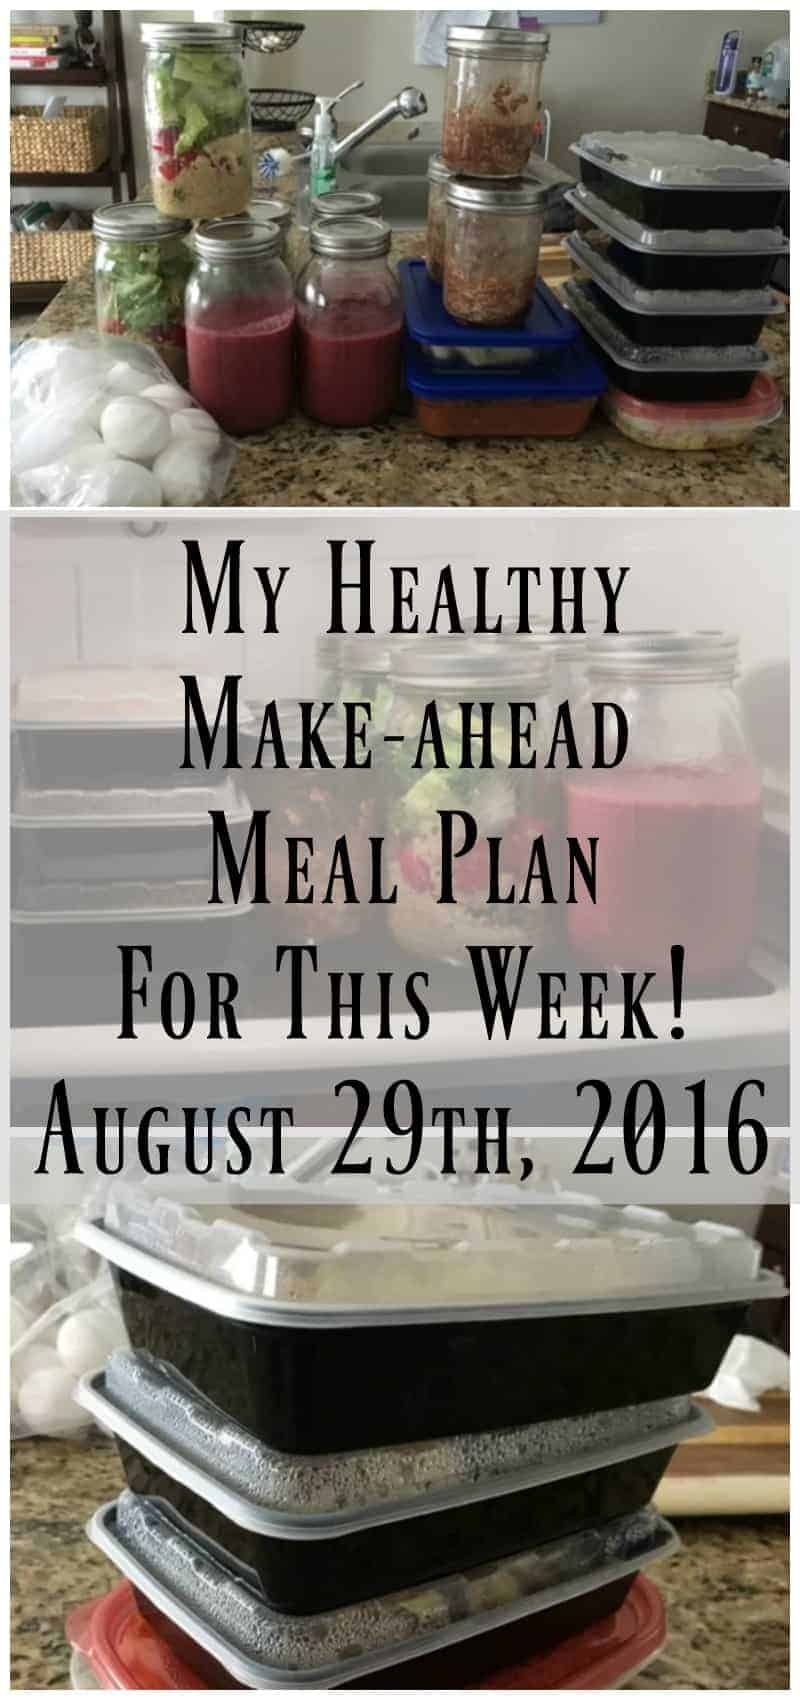 Make-Ahead Meal Plan and Weekly Food Prep {August 29th, 2016}